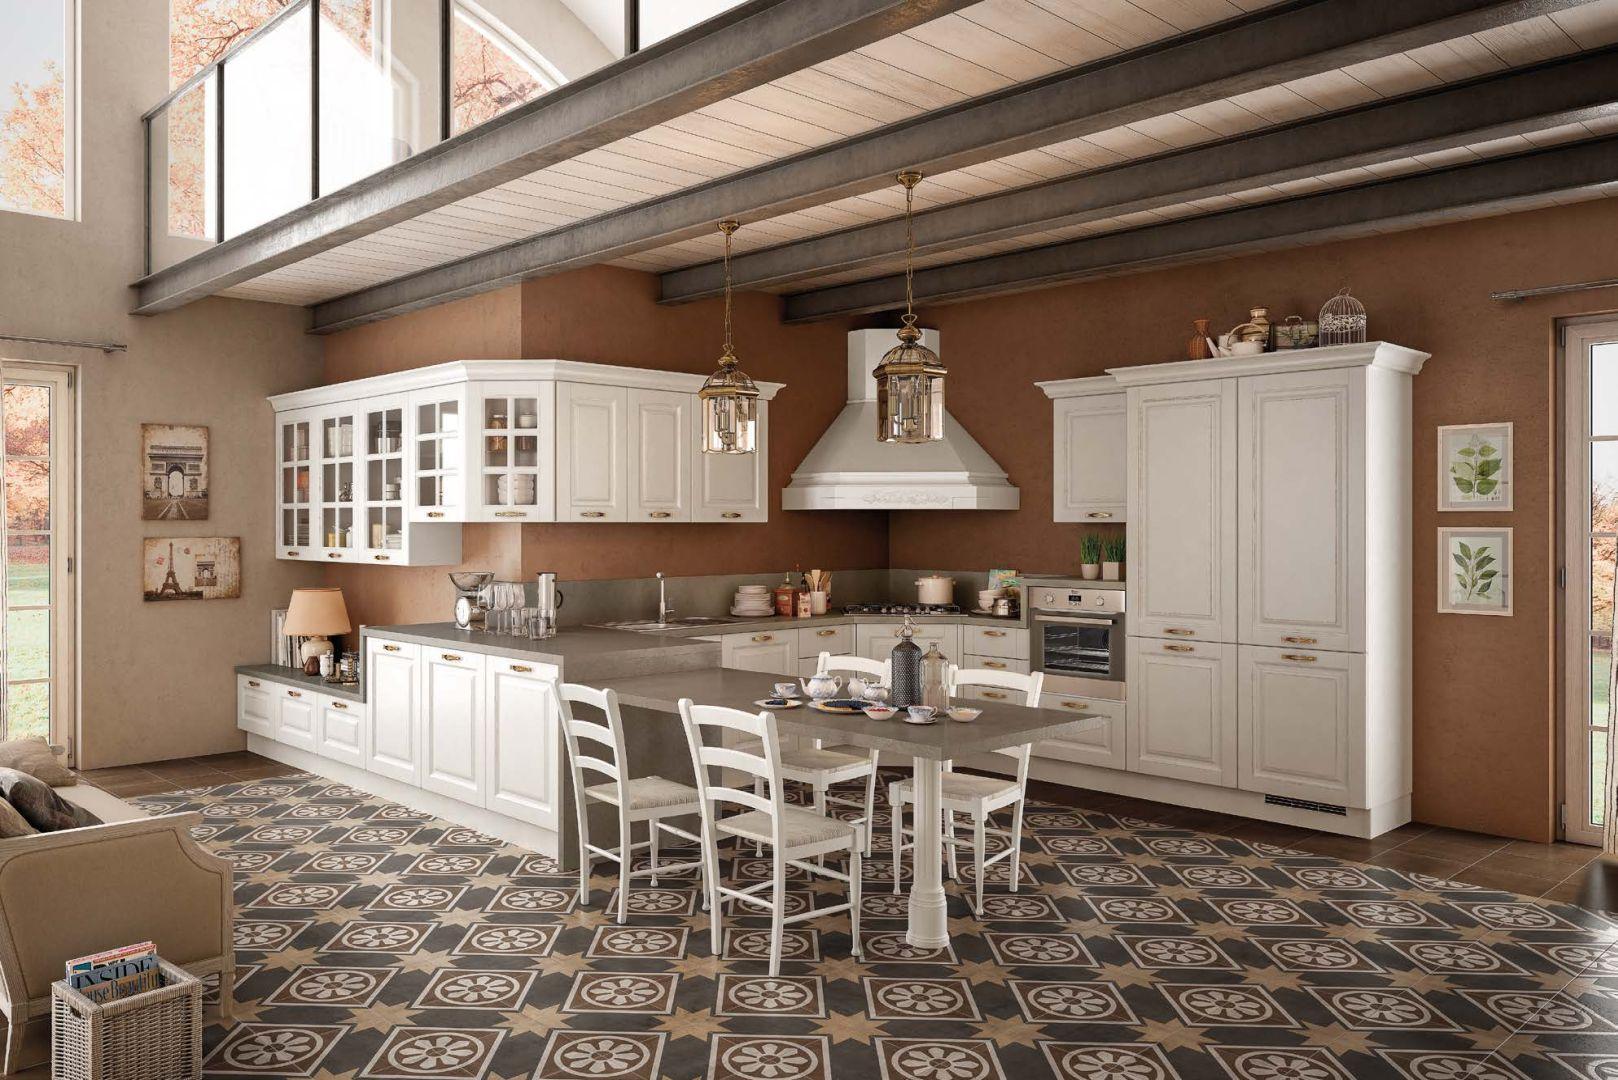 SOFIA μασίφ κουζίνα λευκό με ξέβγαλμα